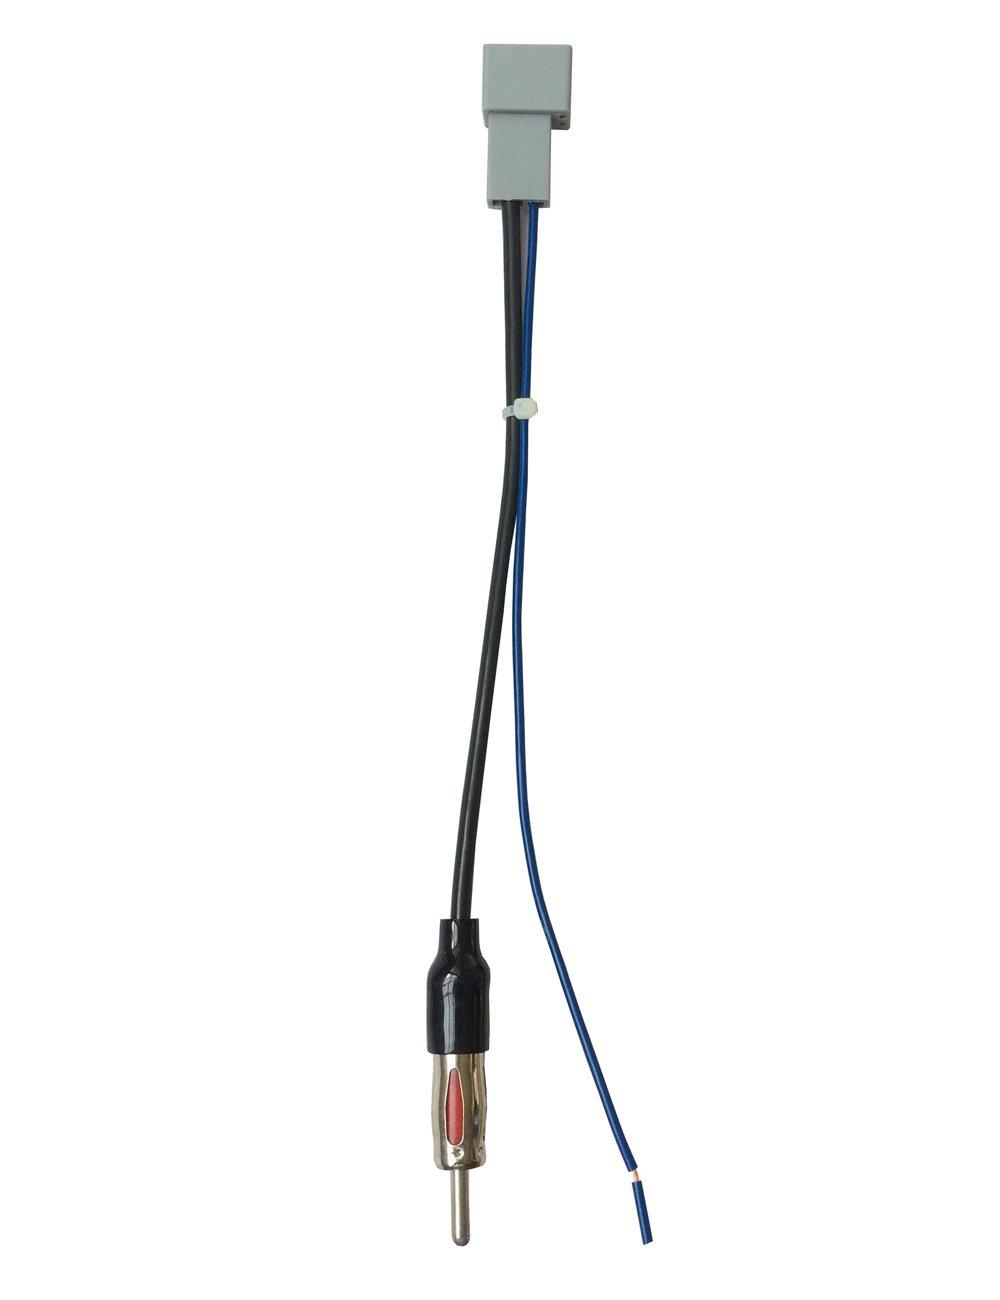 DKMUS Car Radio Antenna Adapter to Aftermarket Radio for Select Honda Acura Mazda